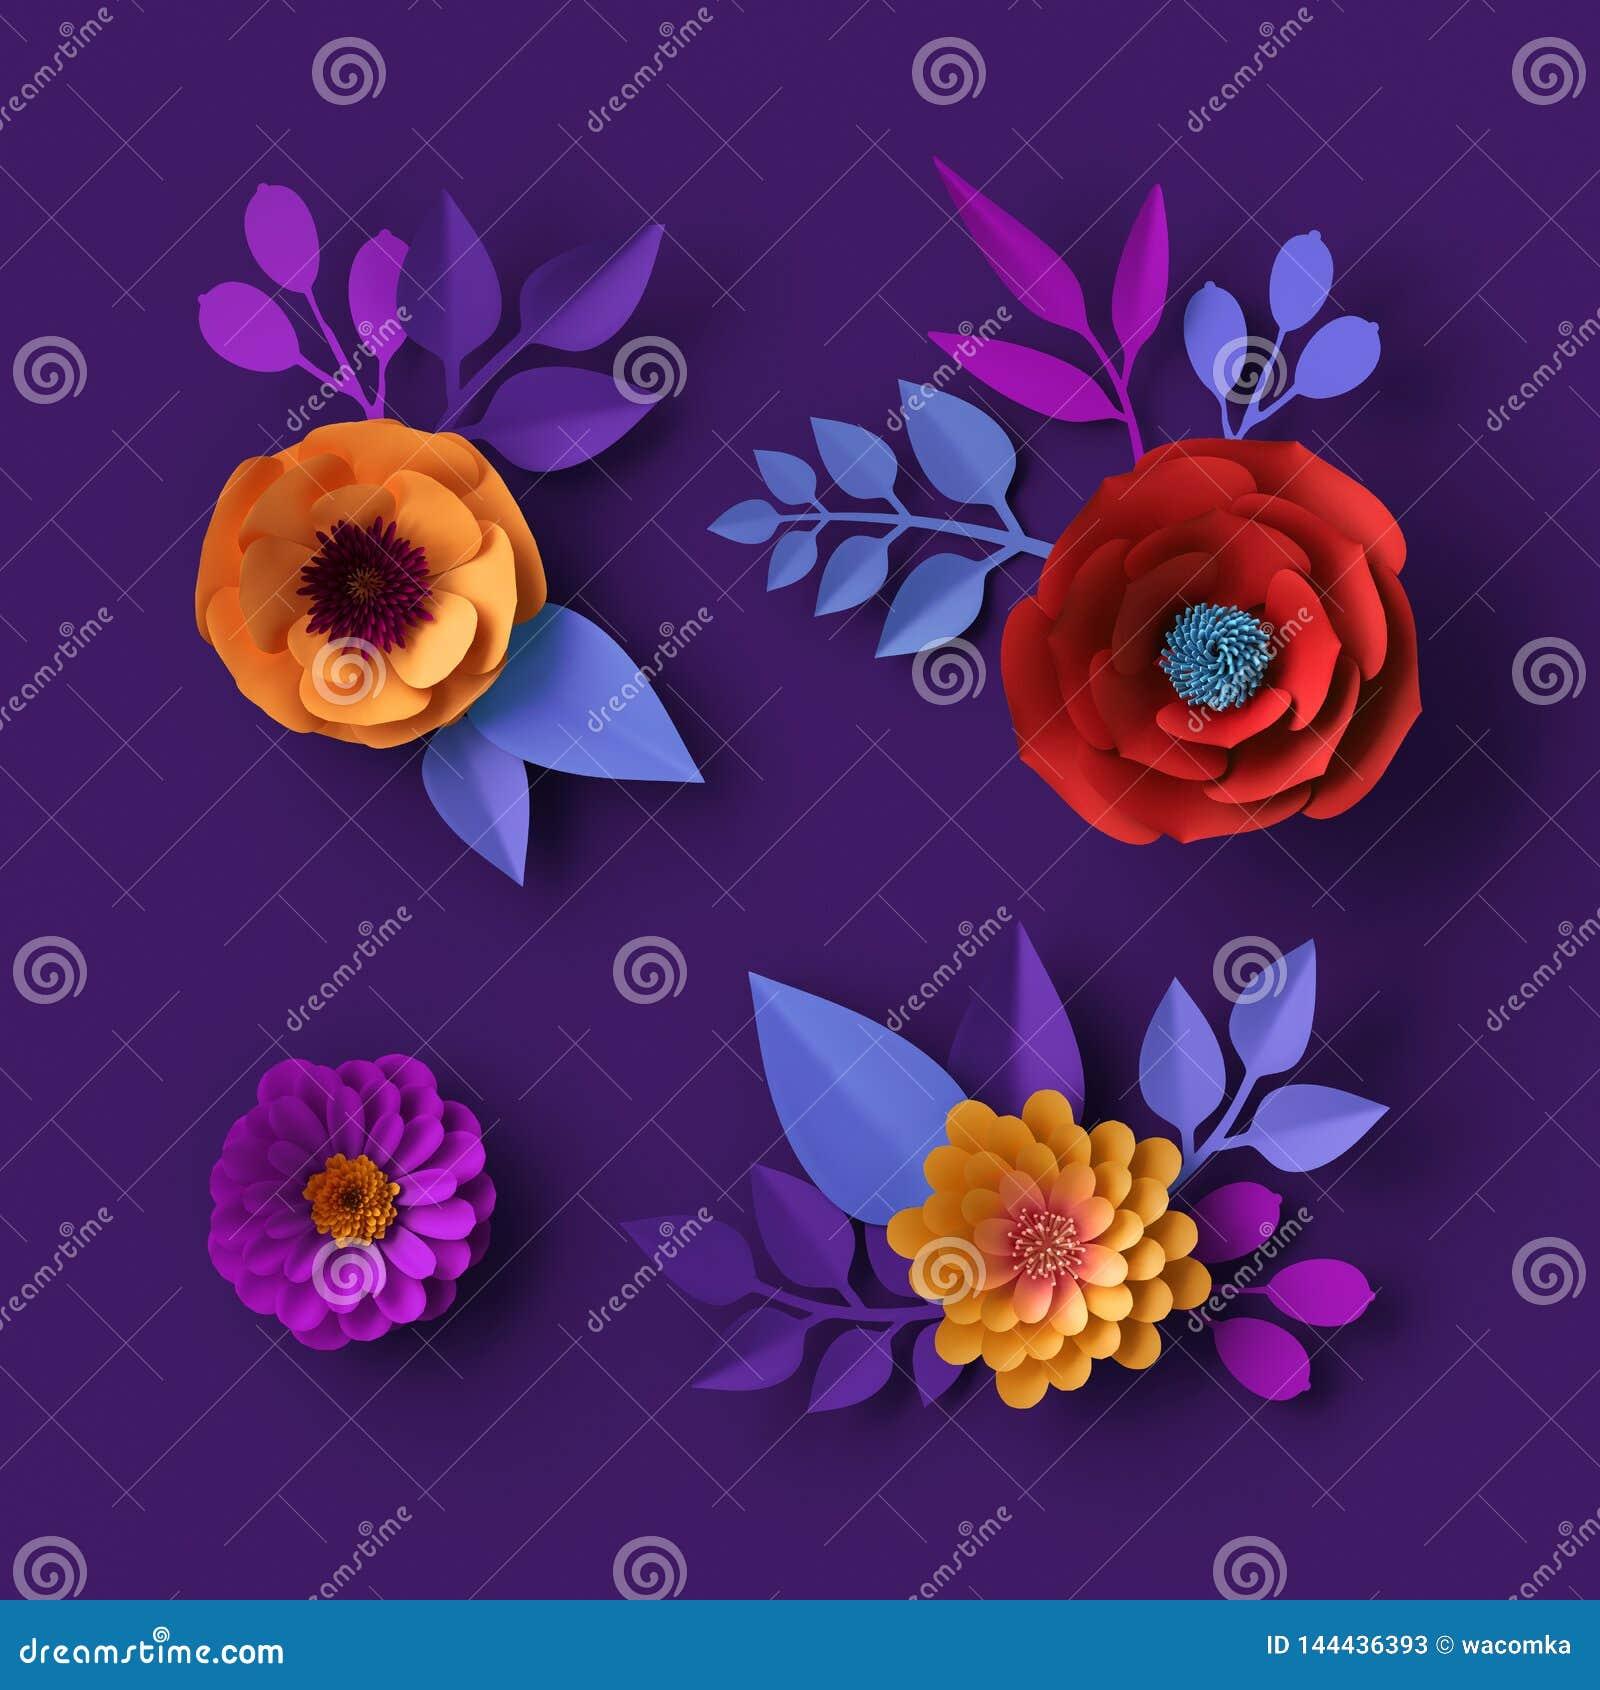 3d Colorful Neon Paper Flowers Wallpaper, Botanical ...